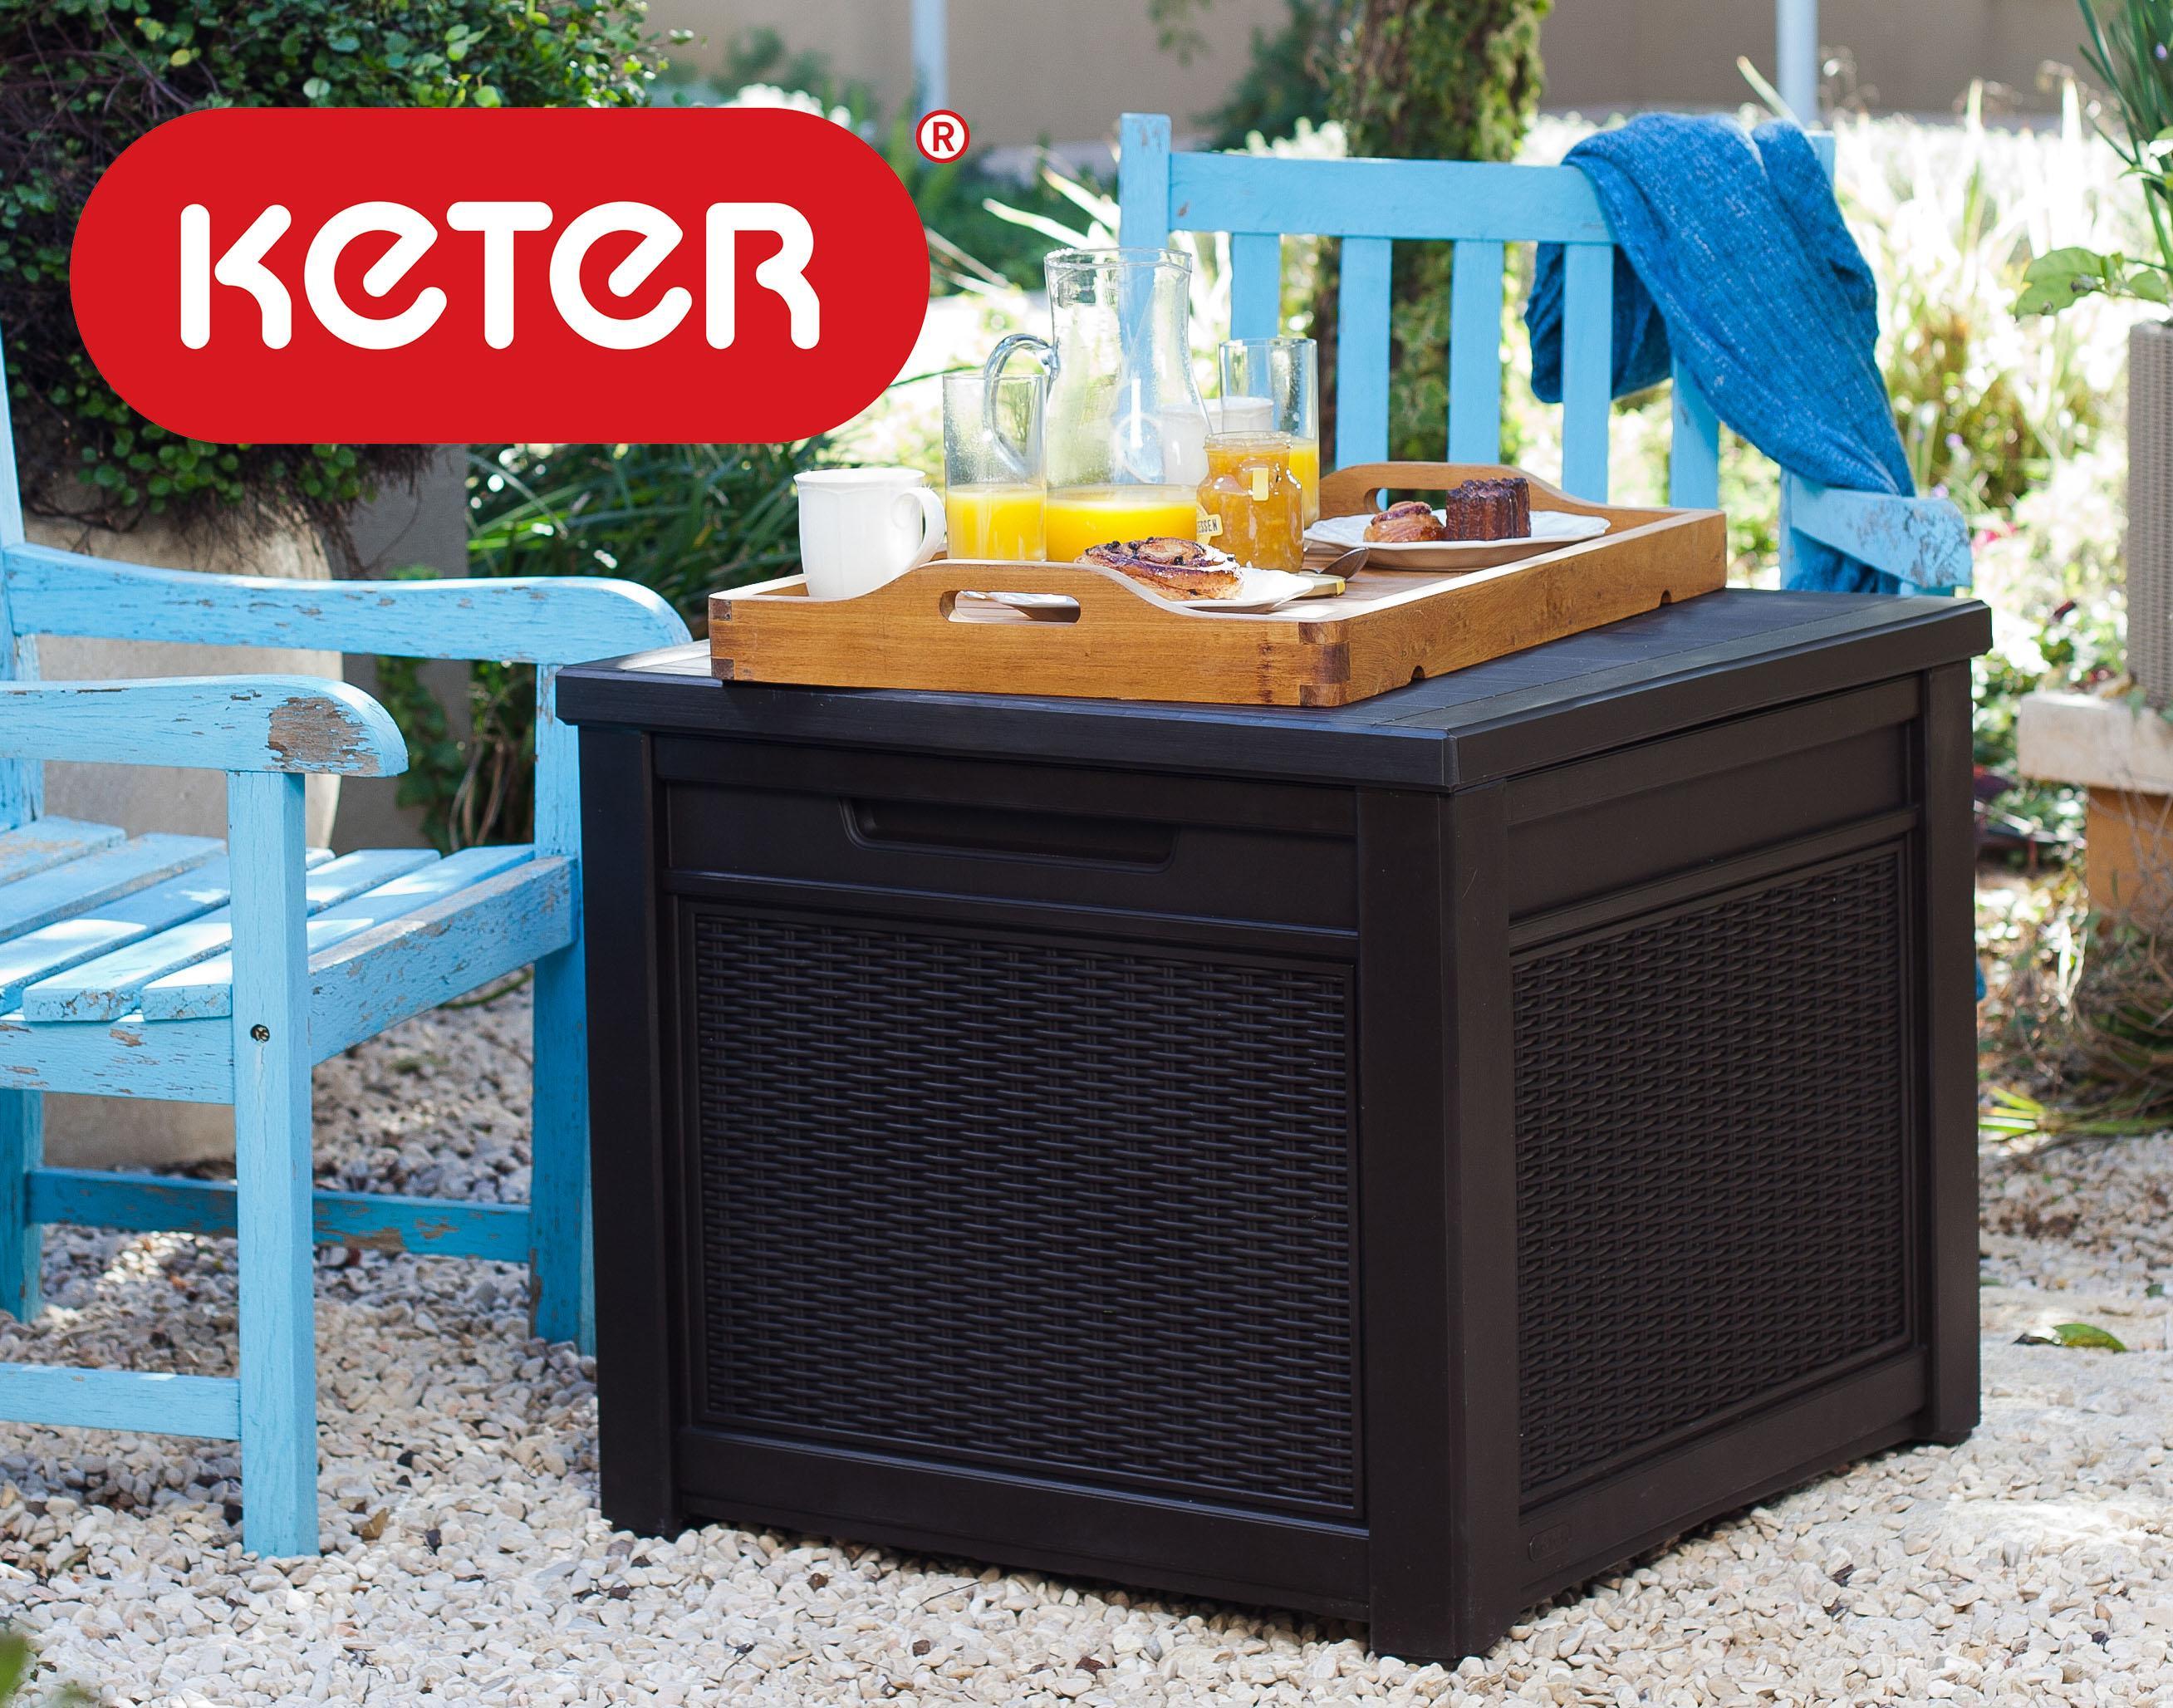 keter 55 gallon outdoor rattan style storage. Black Bedroom Furniture Sets. Home Design Ideas